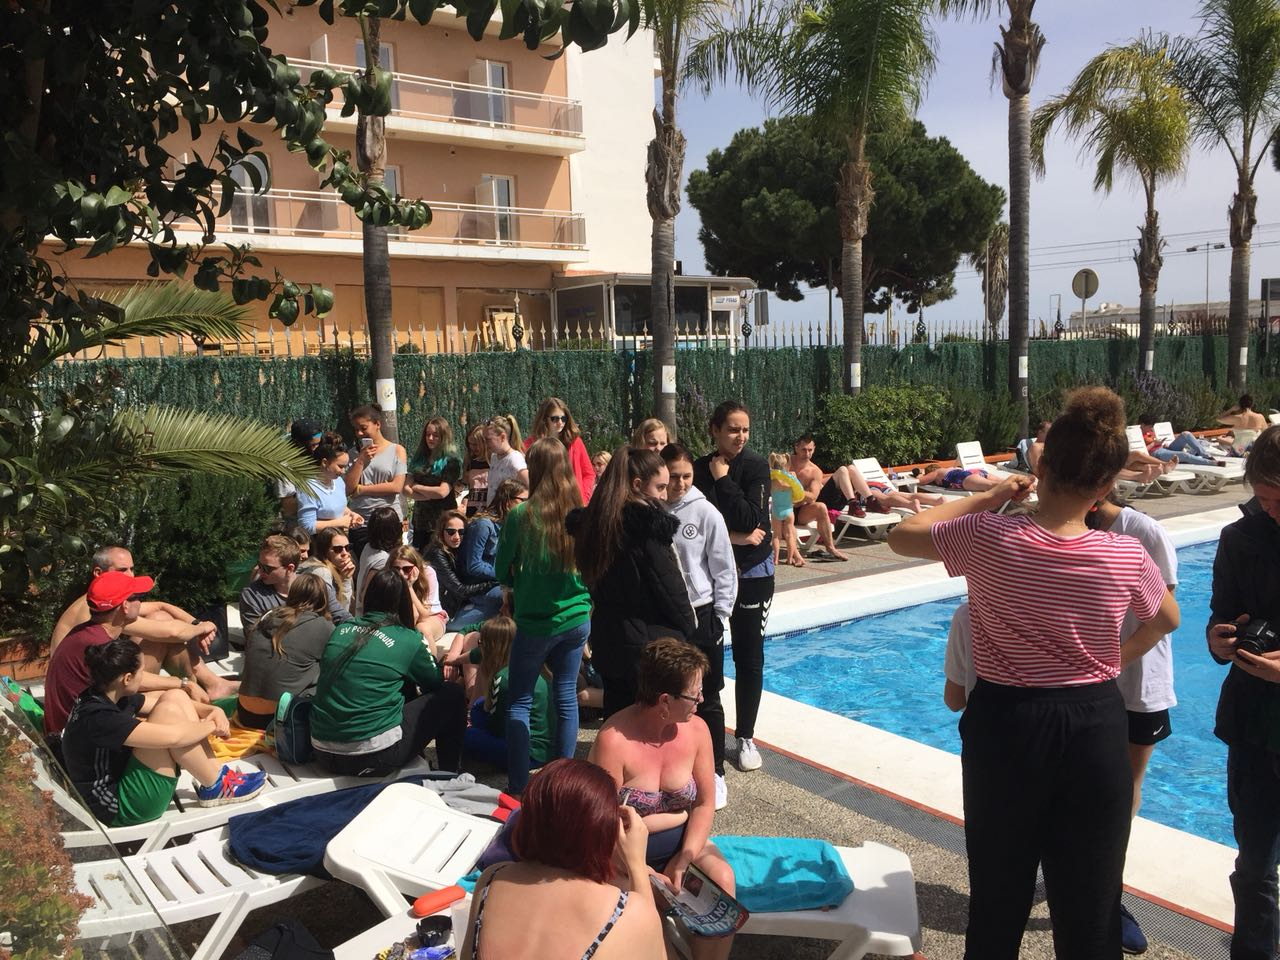 Besprechung am Pool